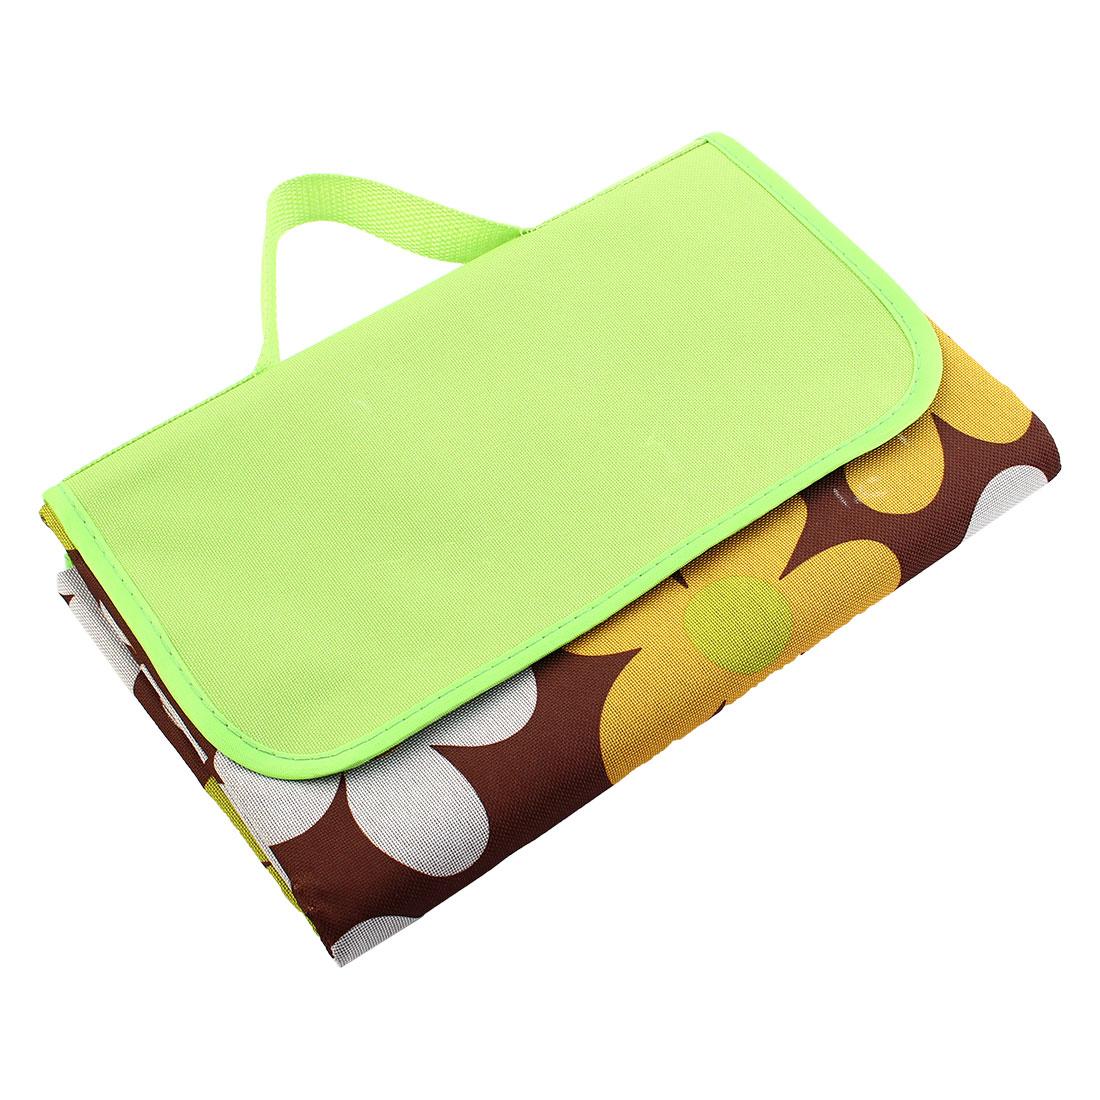 Travel Hiking Water Resistant Pad Foldable Picnic Blanket Portable Camping Mat